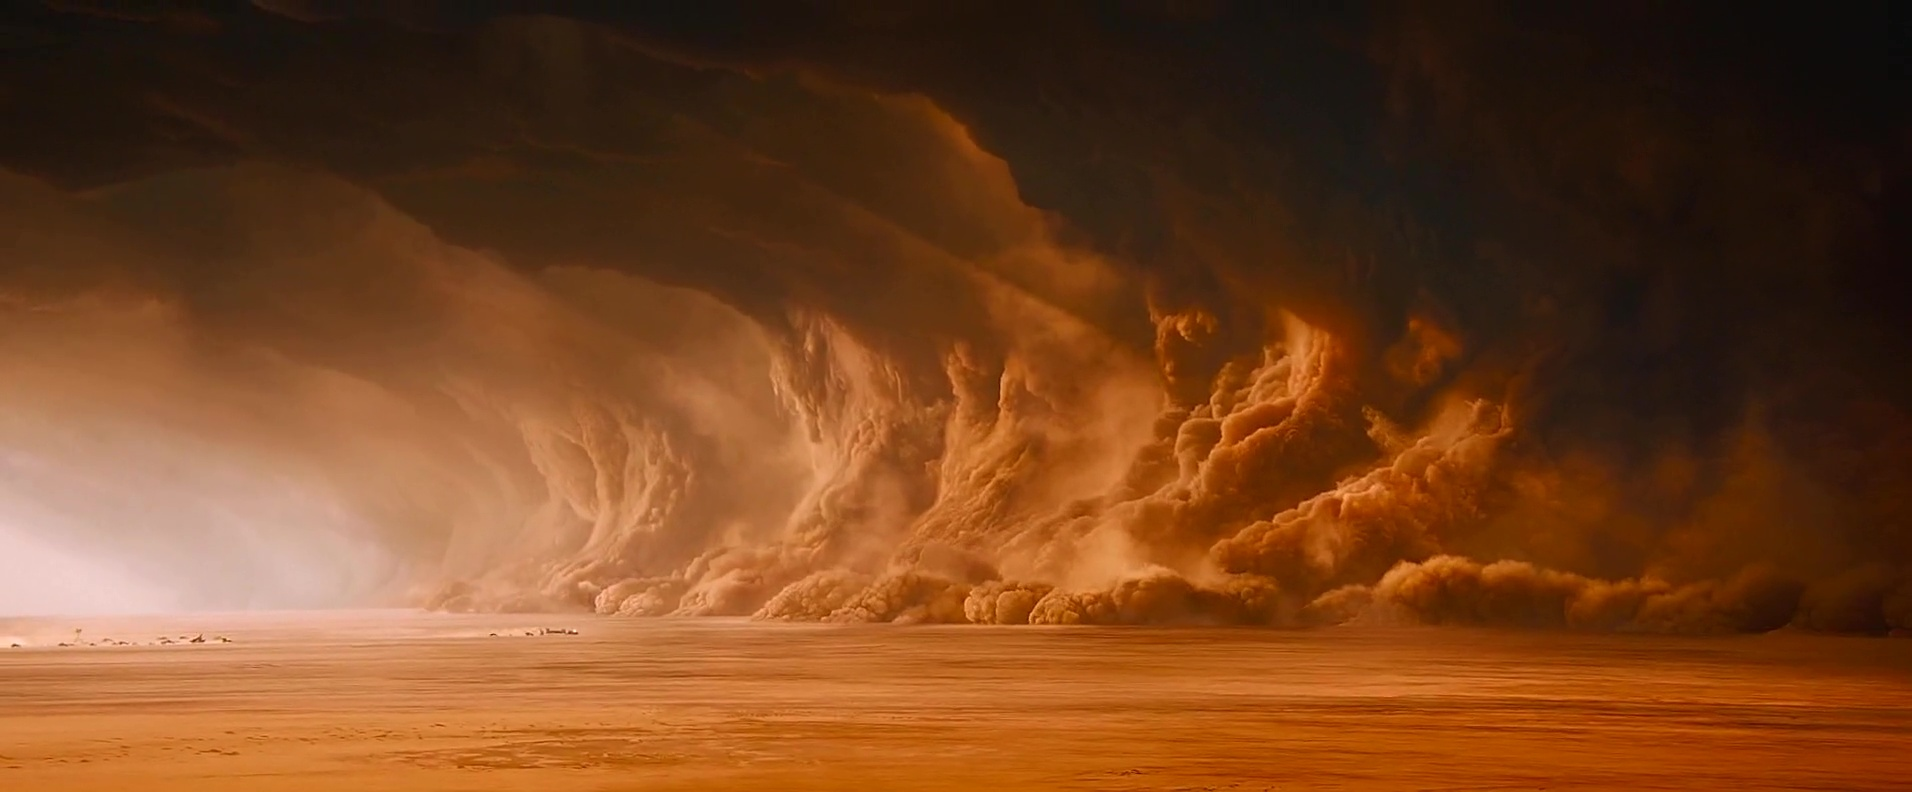 Galerie Mad Max : Fury Road 4